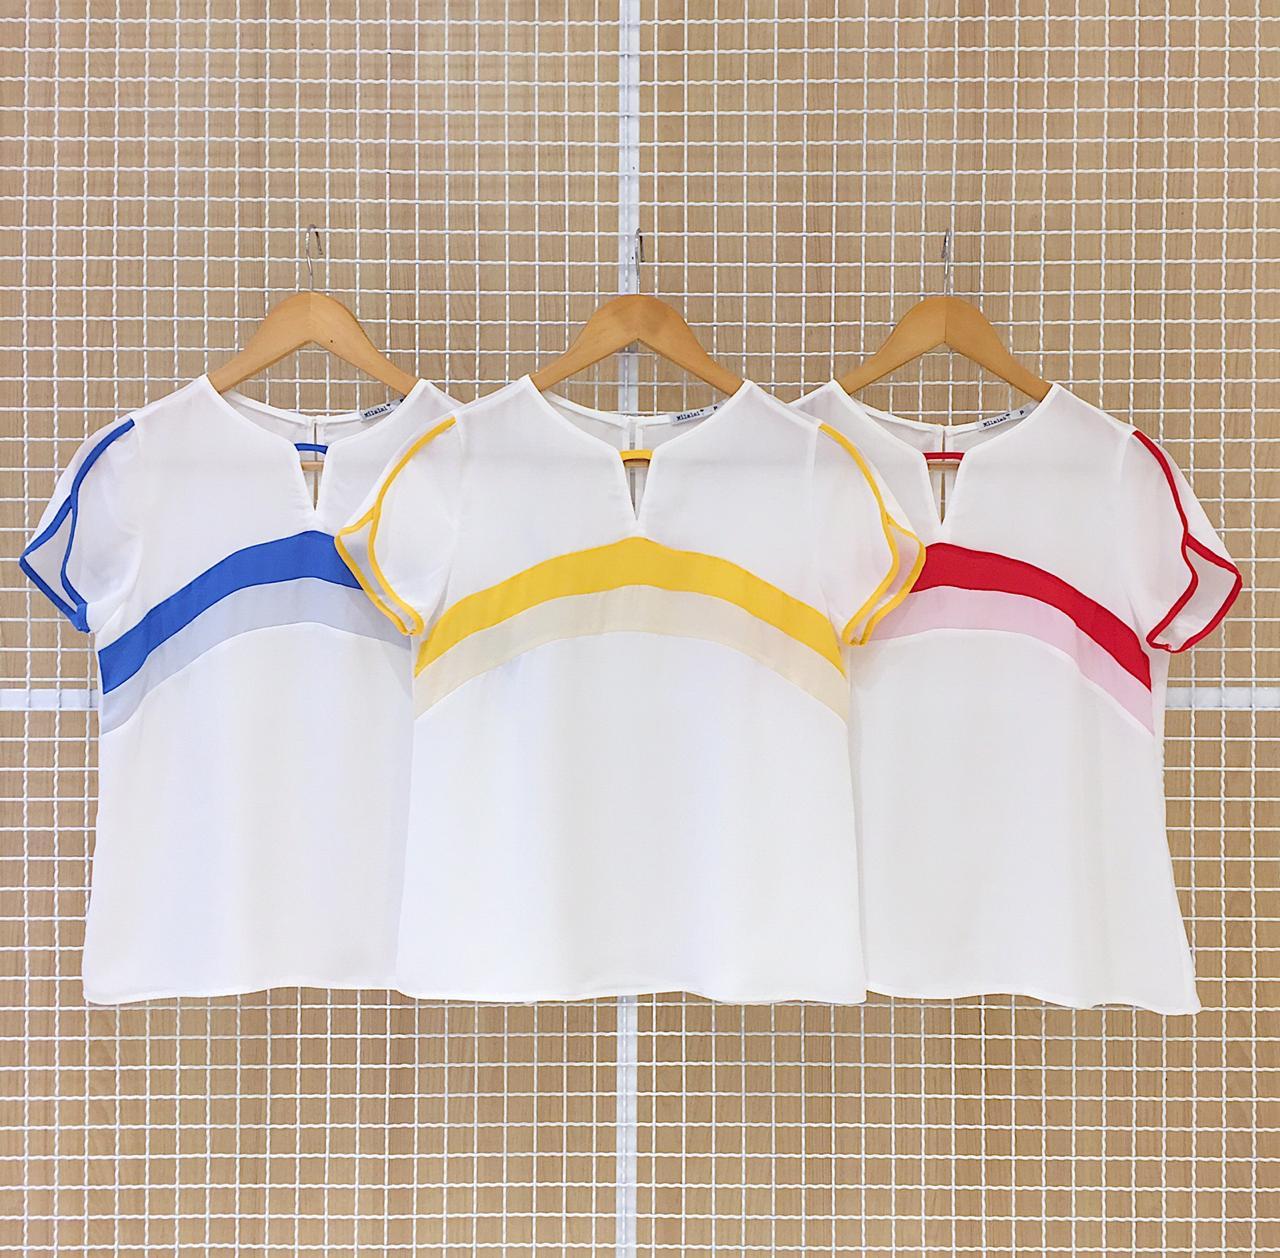 Blusa Bicolor Milalai em Crepe com Manga Curta